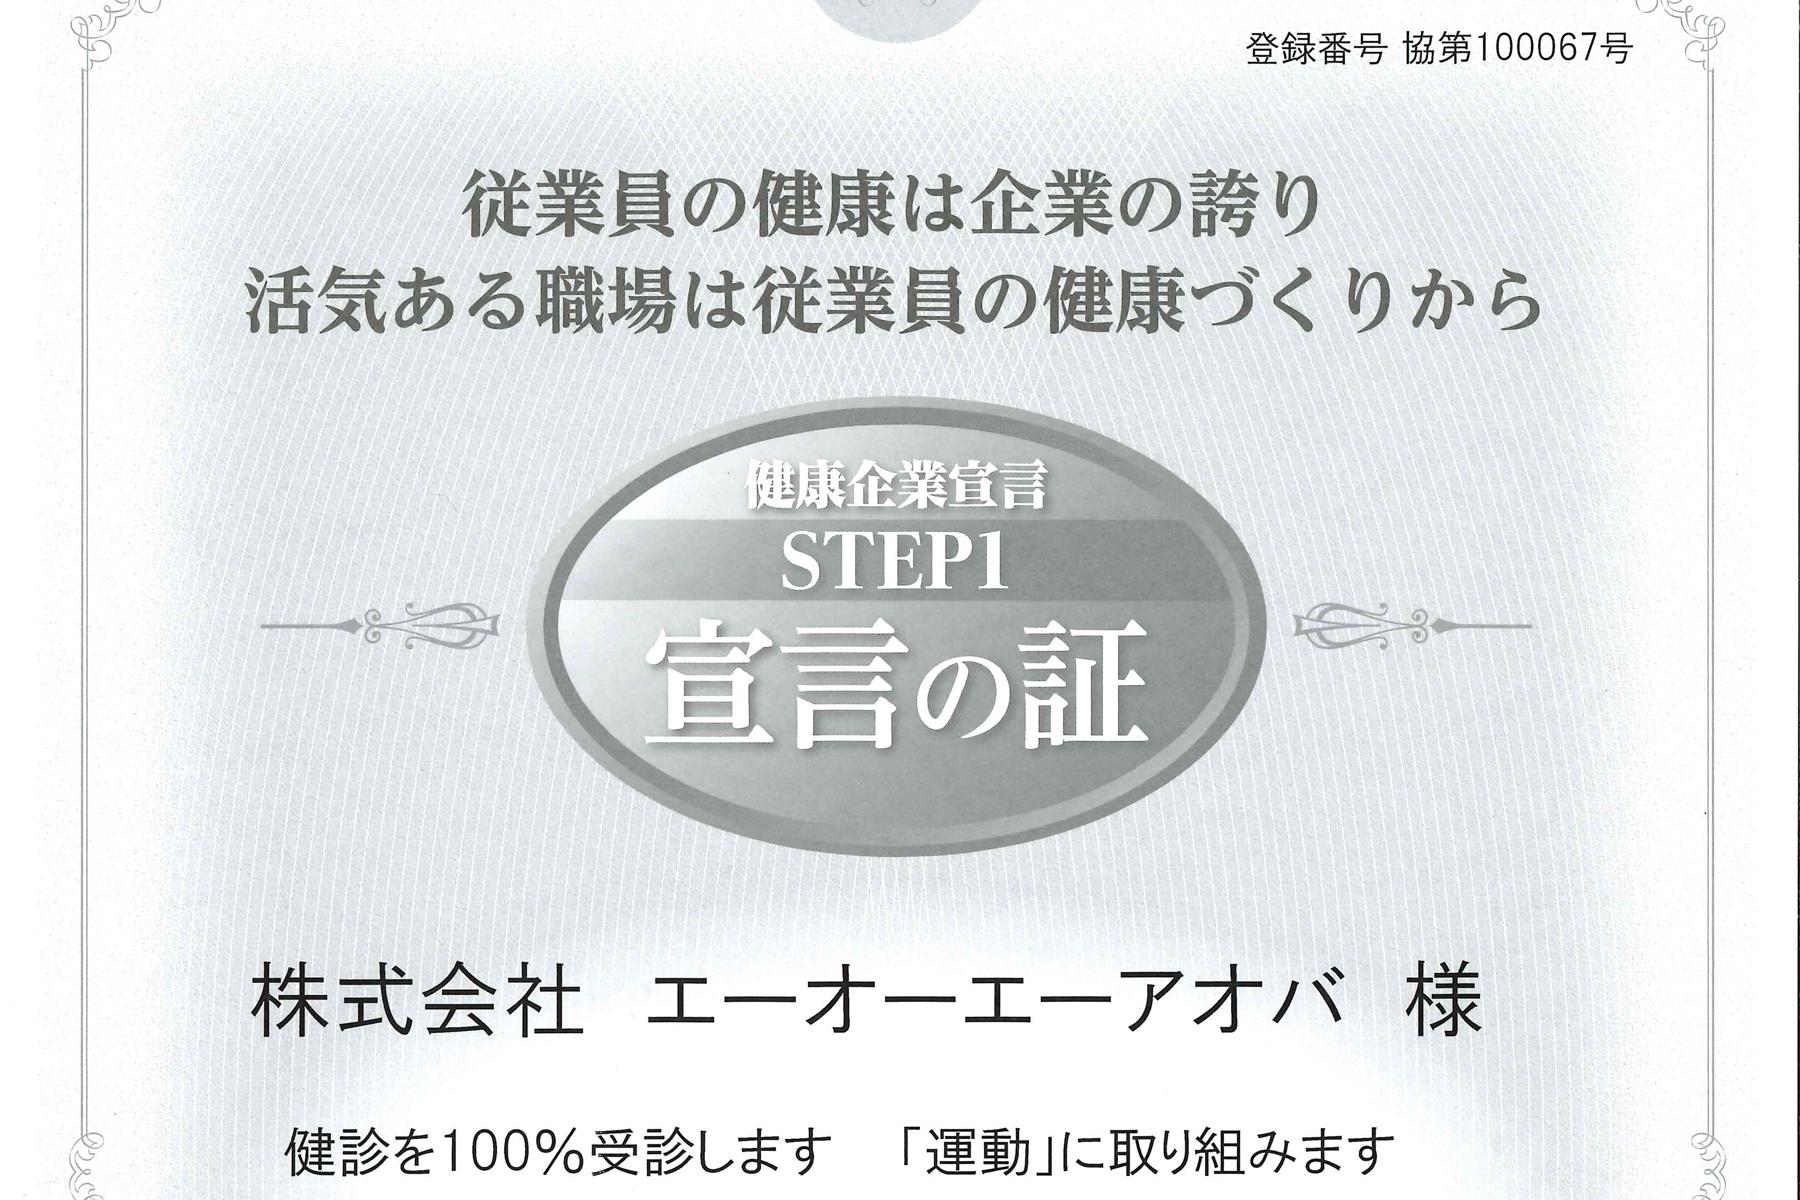 健康企業宣言STEP1宣言の証